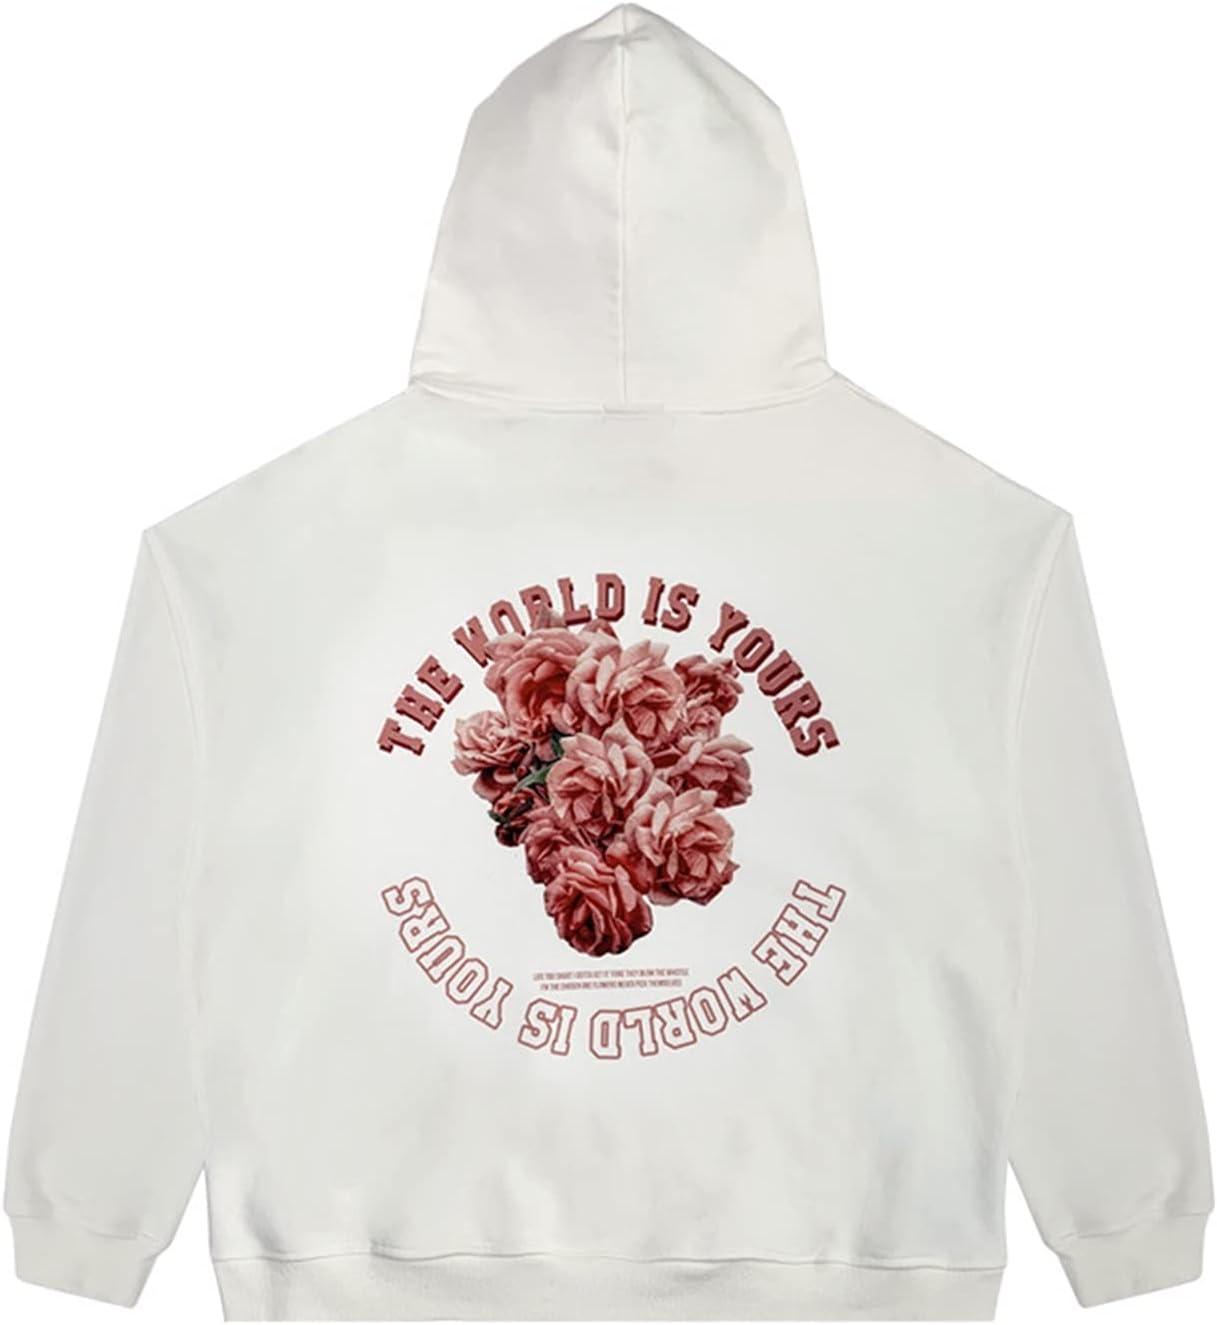 Back to Wild Floral Print Thicken Hoodie Fashion Broken Patch Sweatshirt Loose Hip Hop Streetwear Jacket (Color : White, Size : Medium)